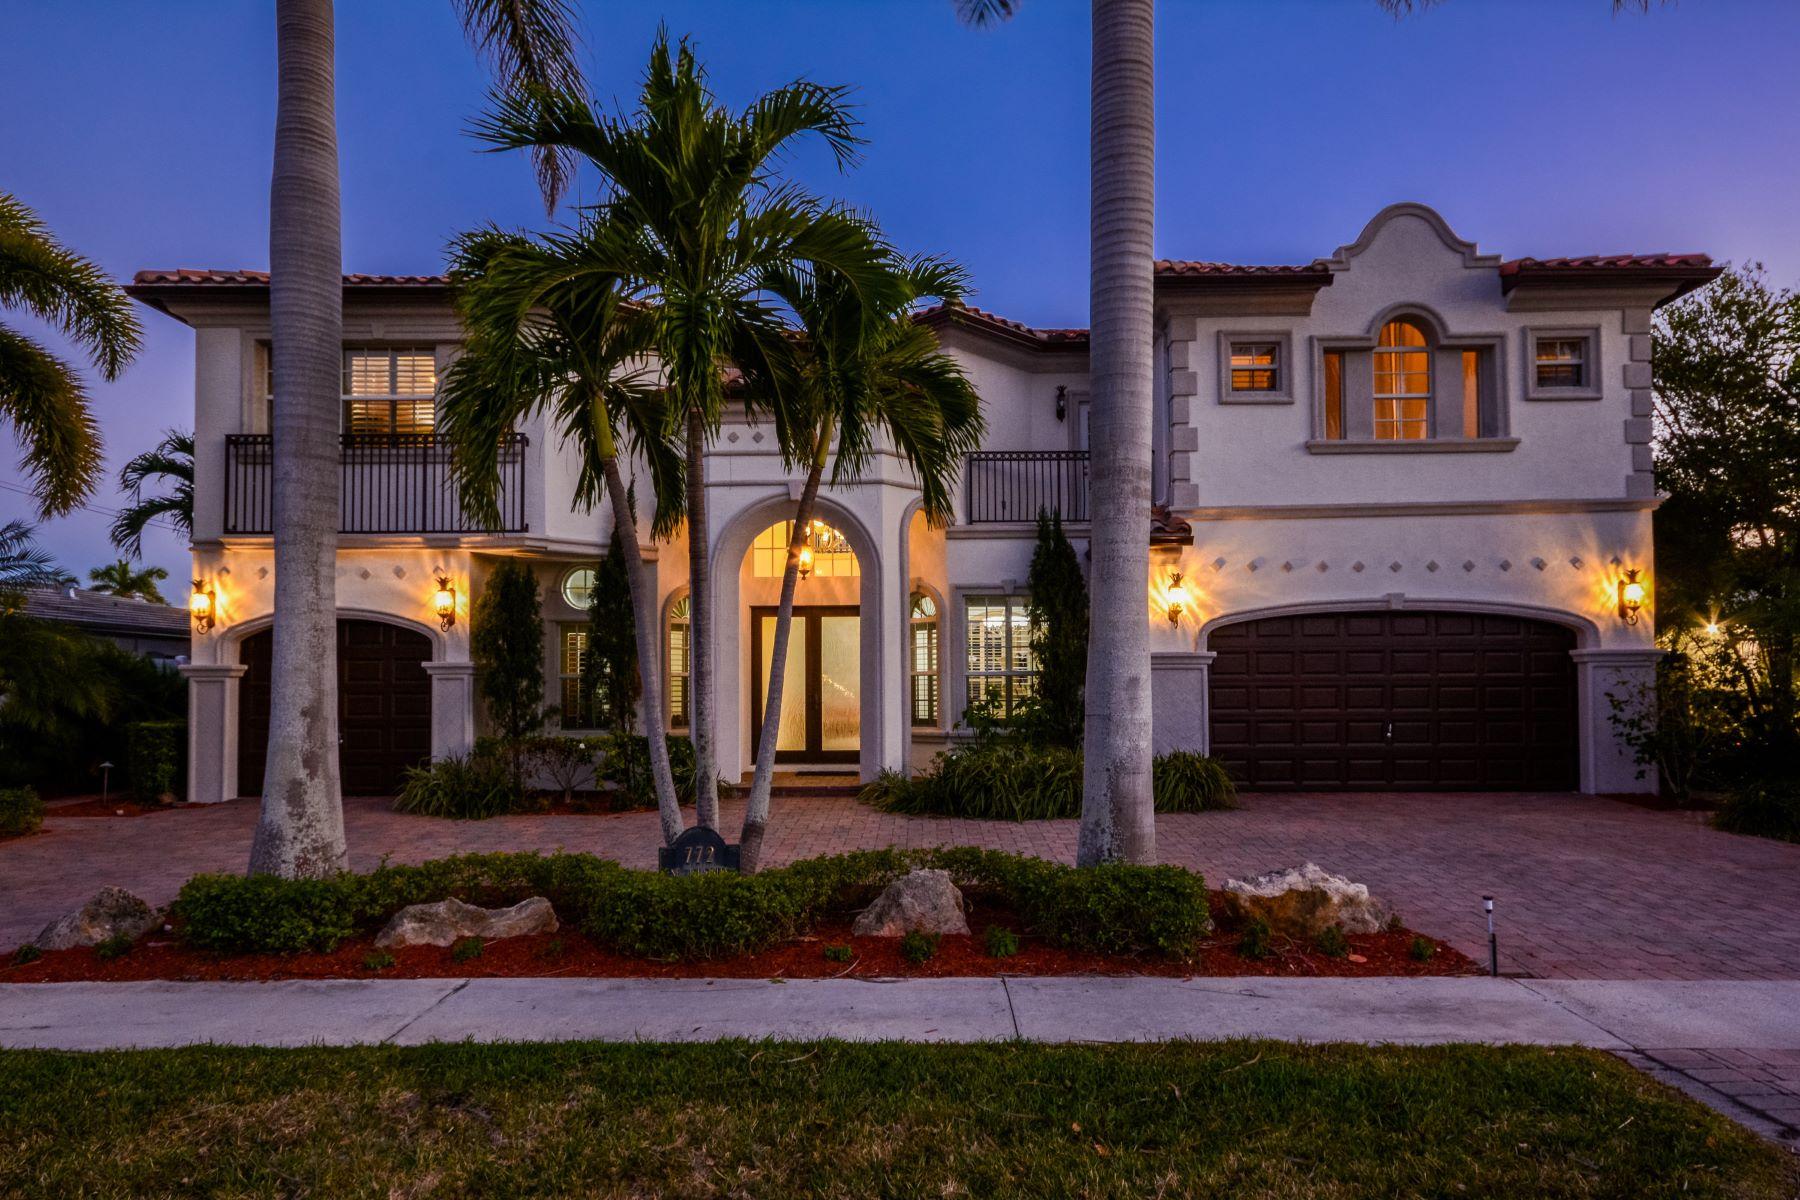 Single Family Home for Rent at 772 NE 71st St , Boca Raton, FL 33487 Boca Raton, Florida, 33487 United States